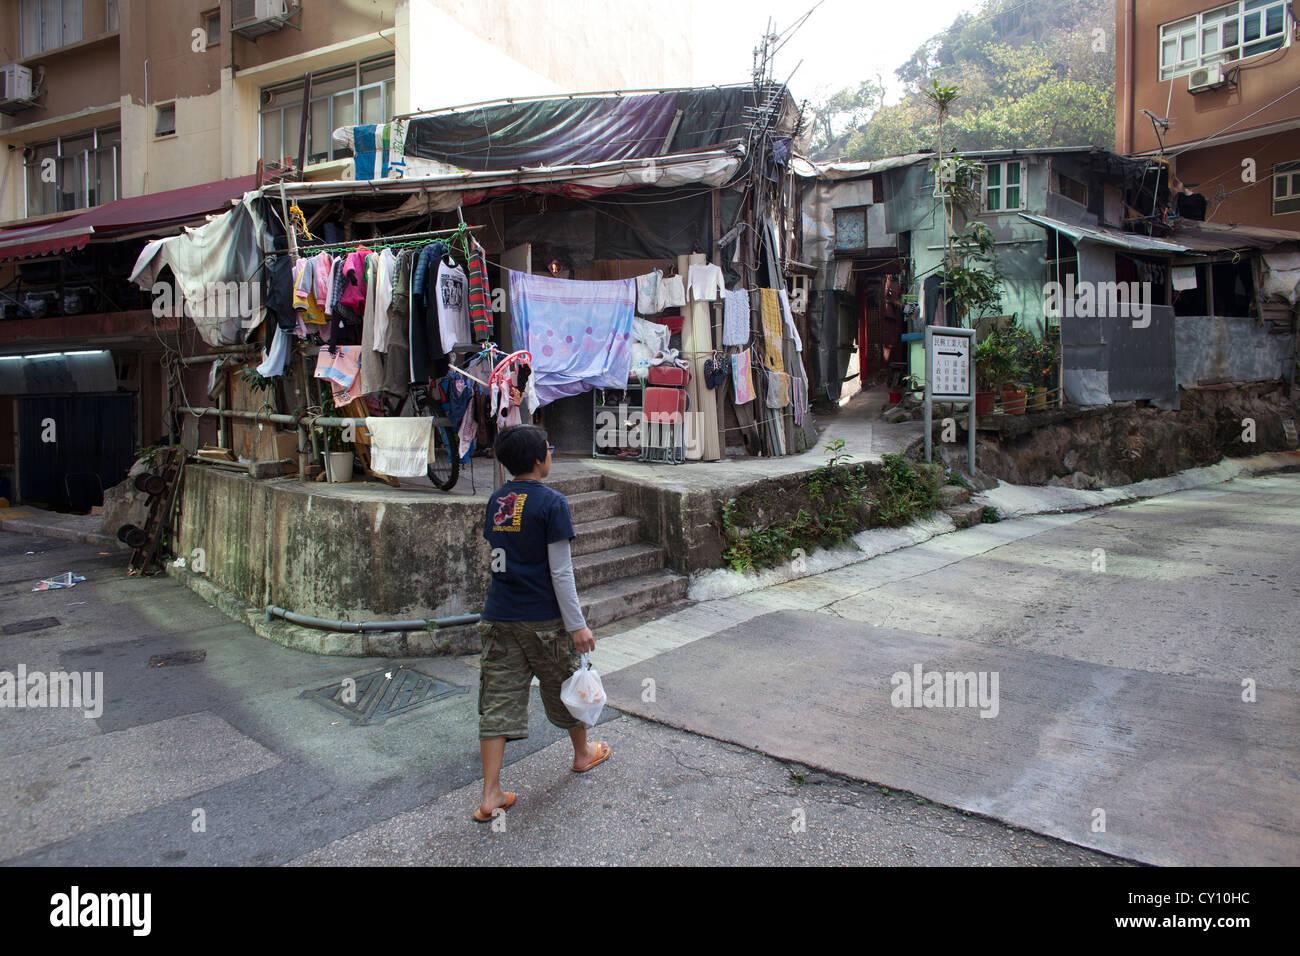 poverty in hongkong - Stock Image